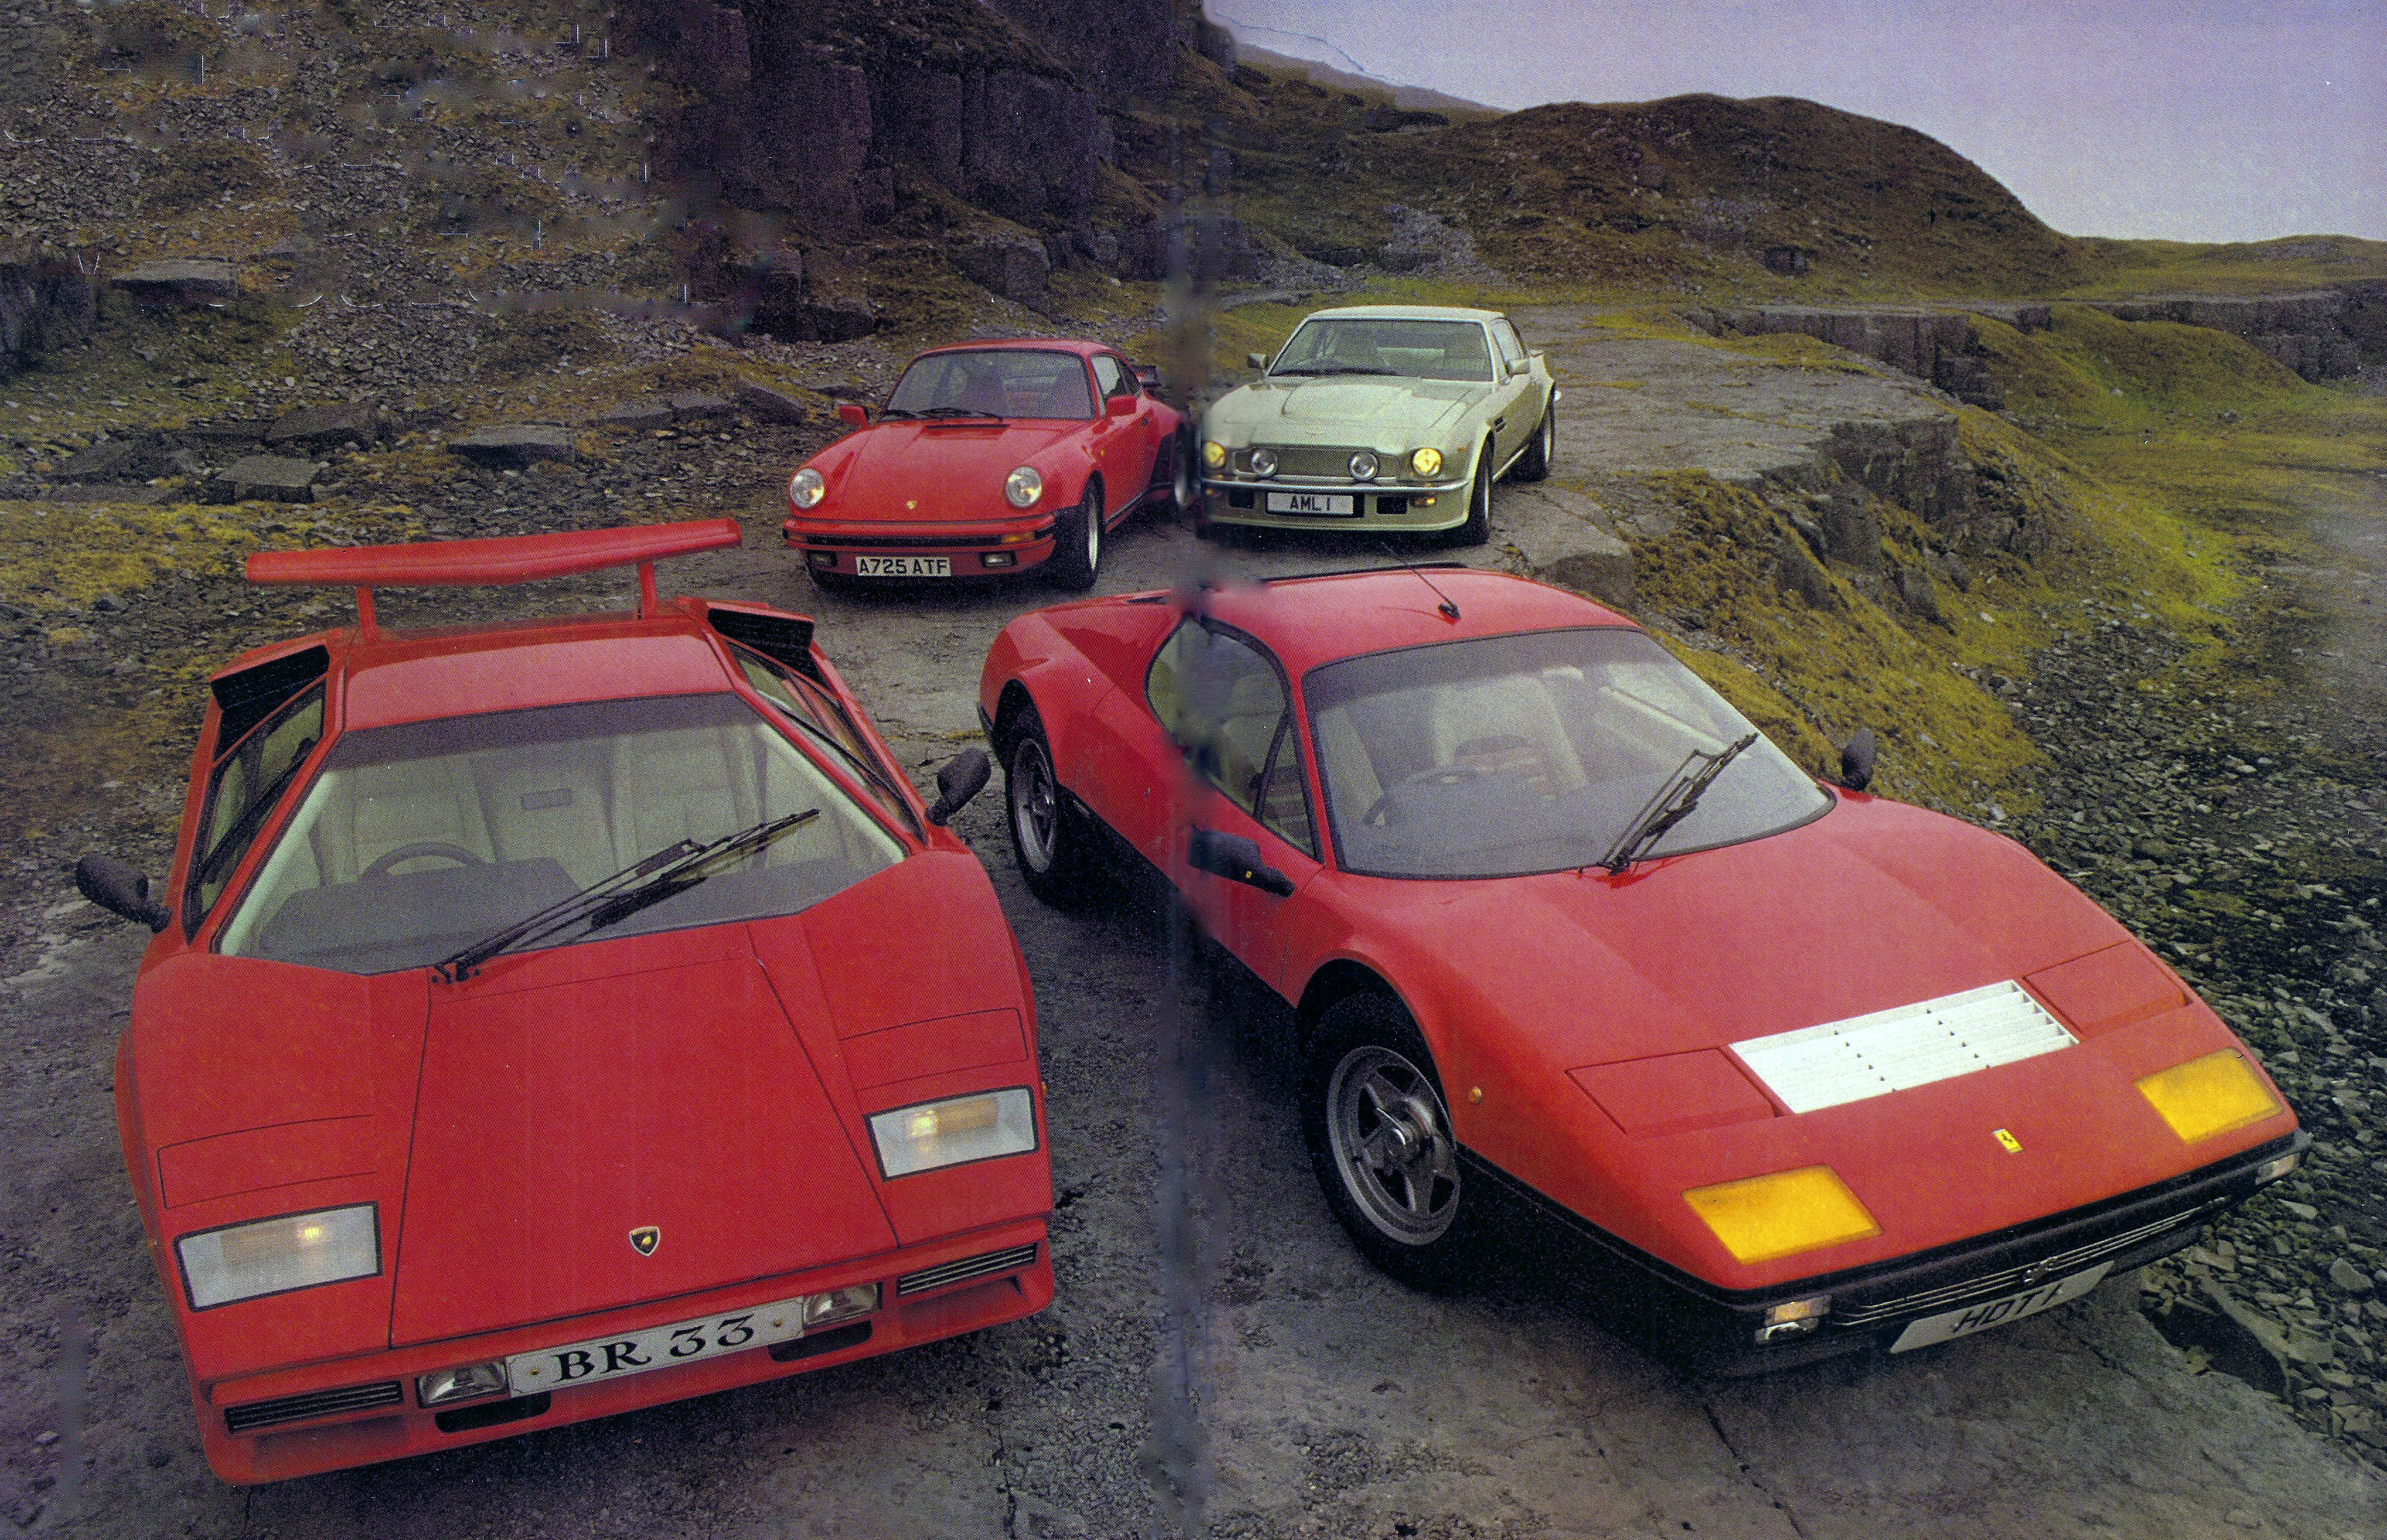 Ferrari-512BBi-Porsche-911-Turbo-Lambo-Countach-Aston-Vantage Breathtaking Lamborghini Countach Owners Manual Pdf Cars Trend